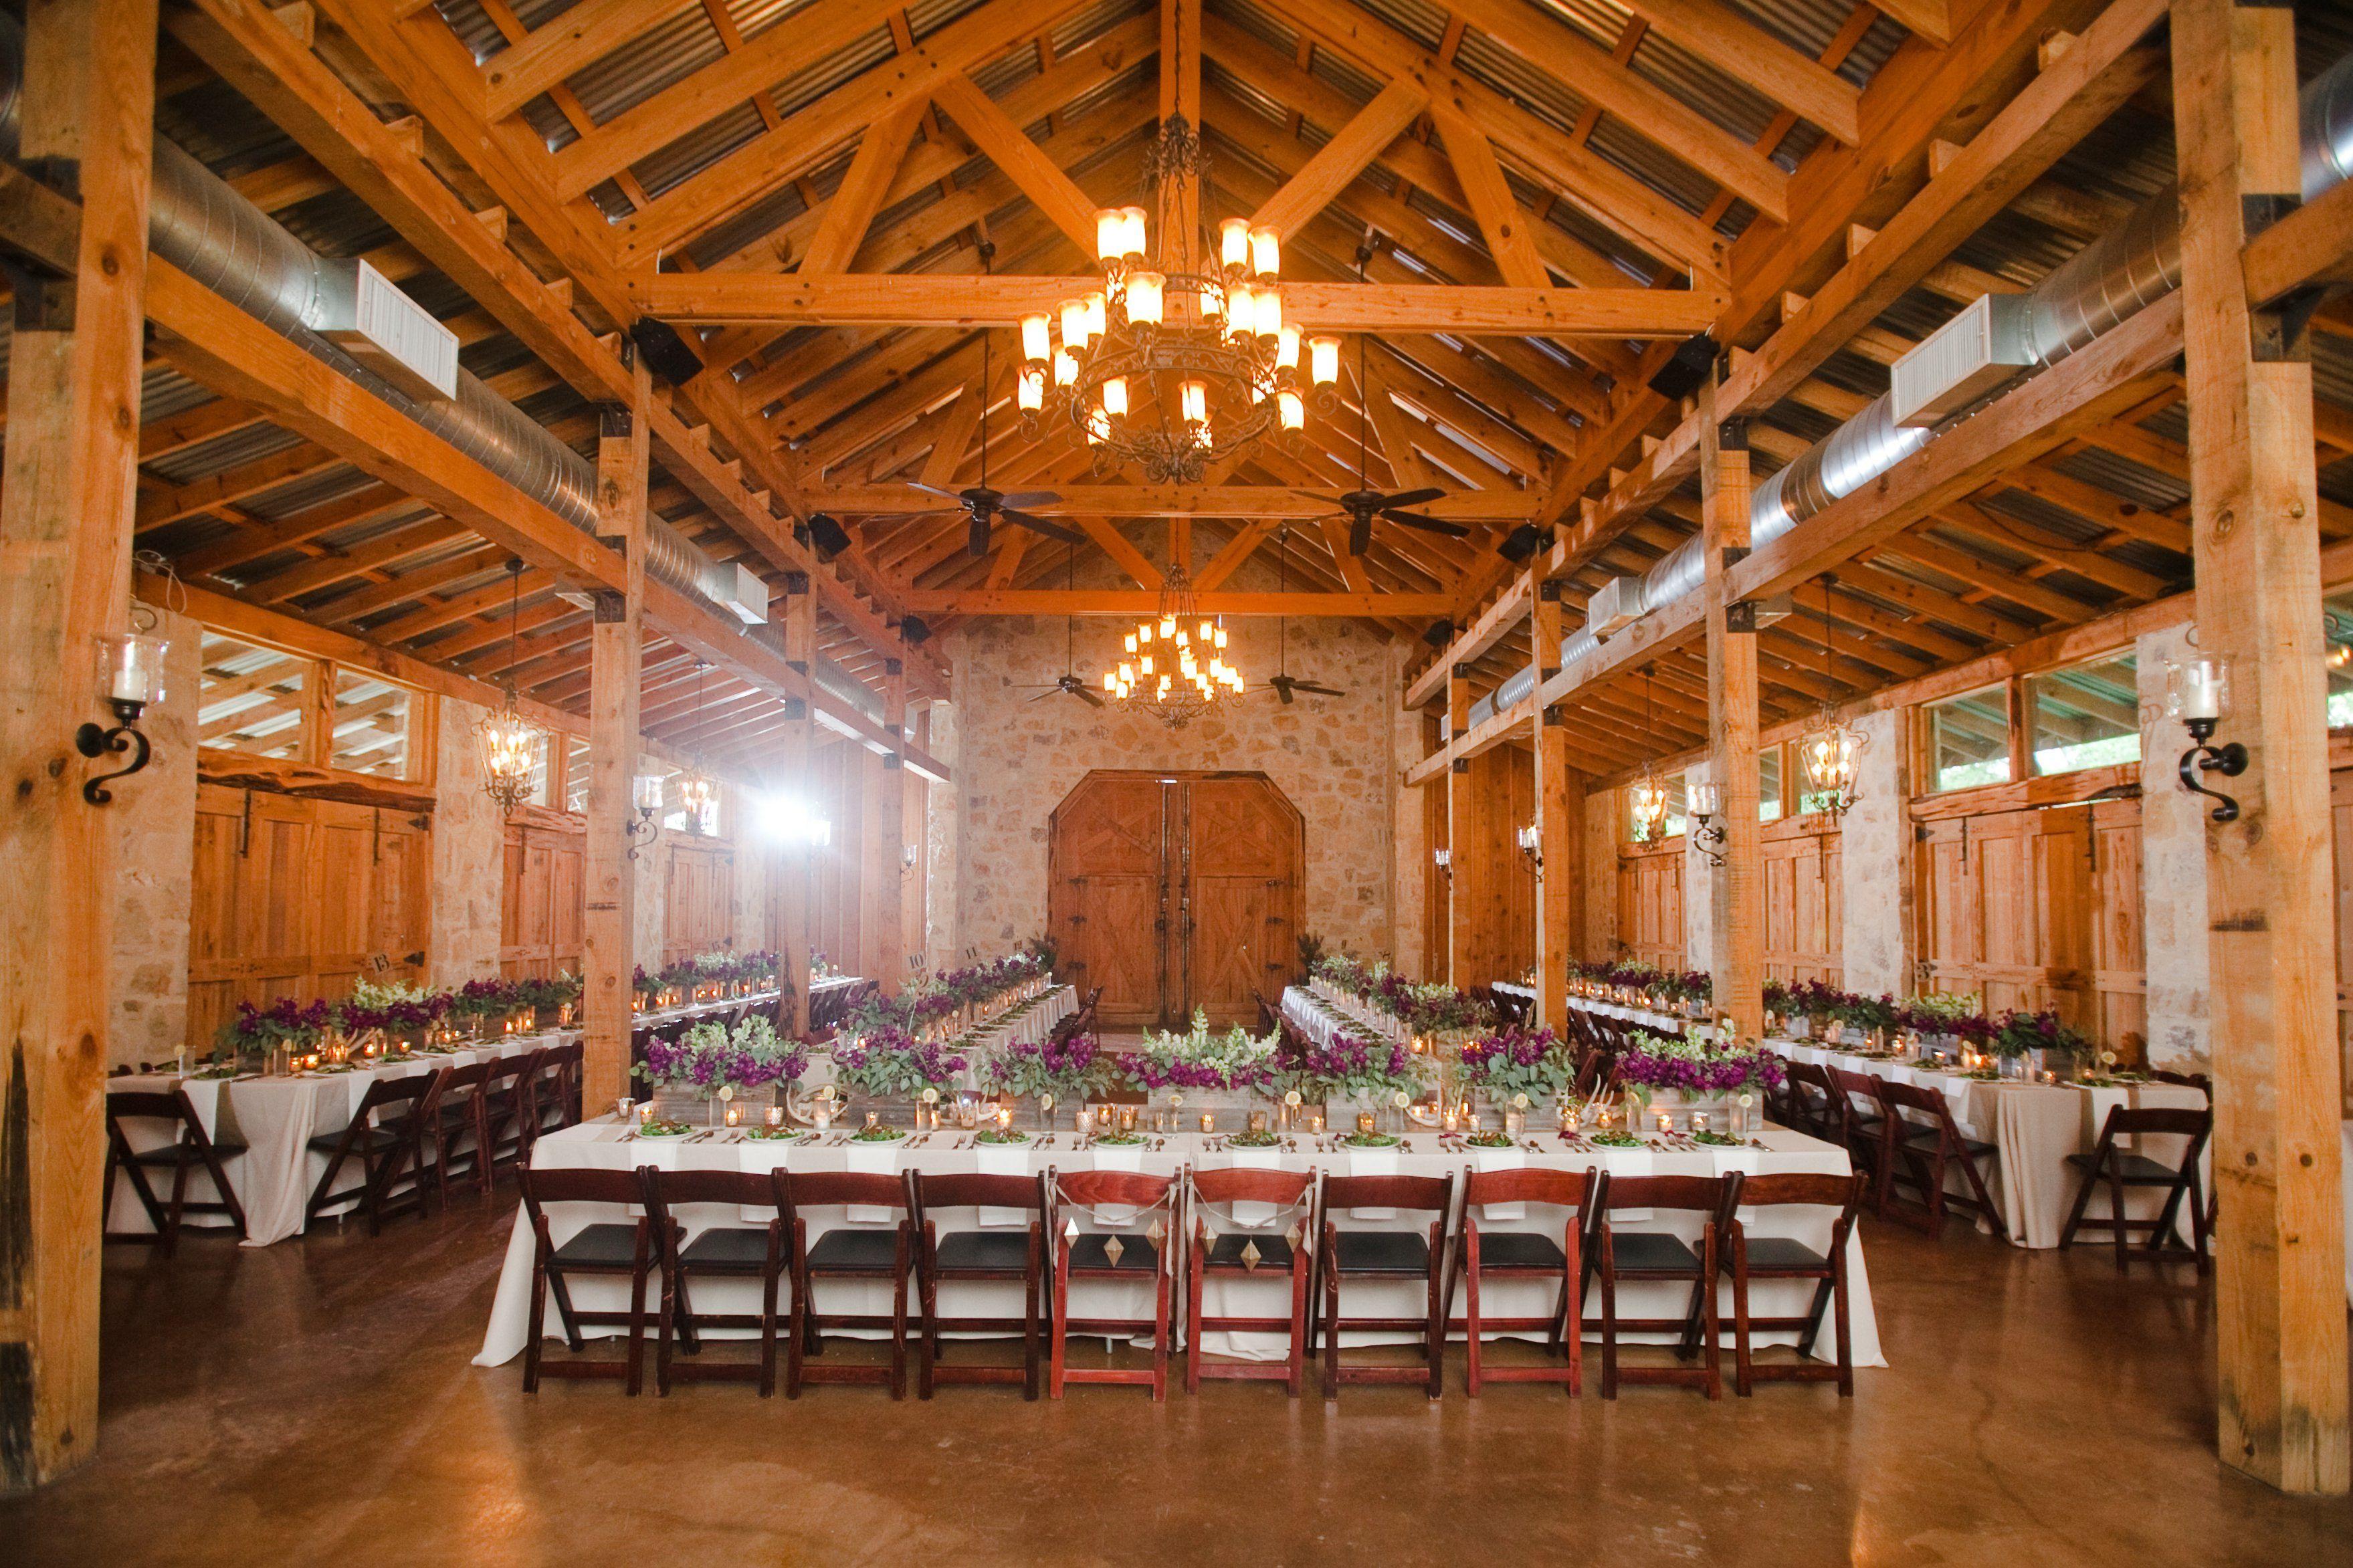 Fall wedding decor ideas  Honey Creek Ranch Reception Area  Wedding Decor Ideas  Pinterest